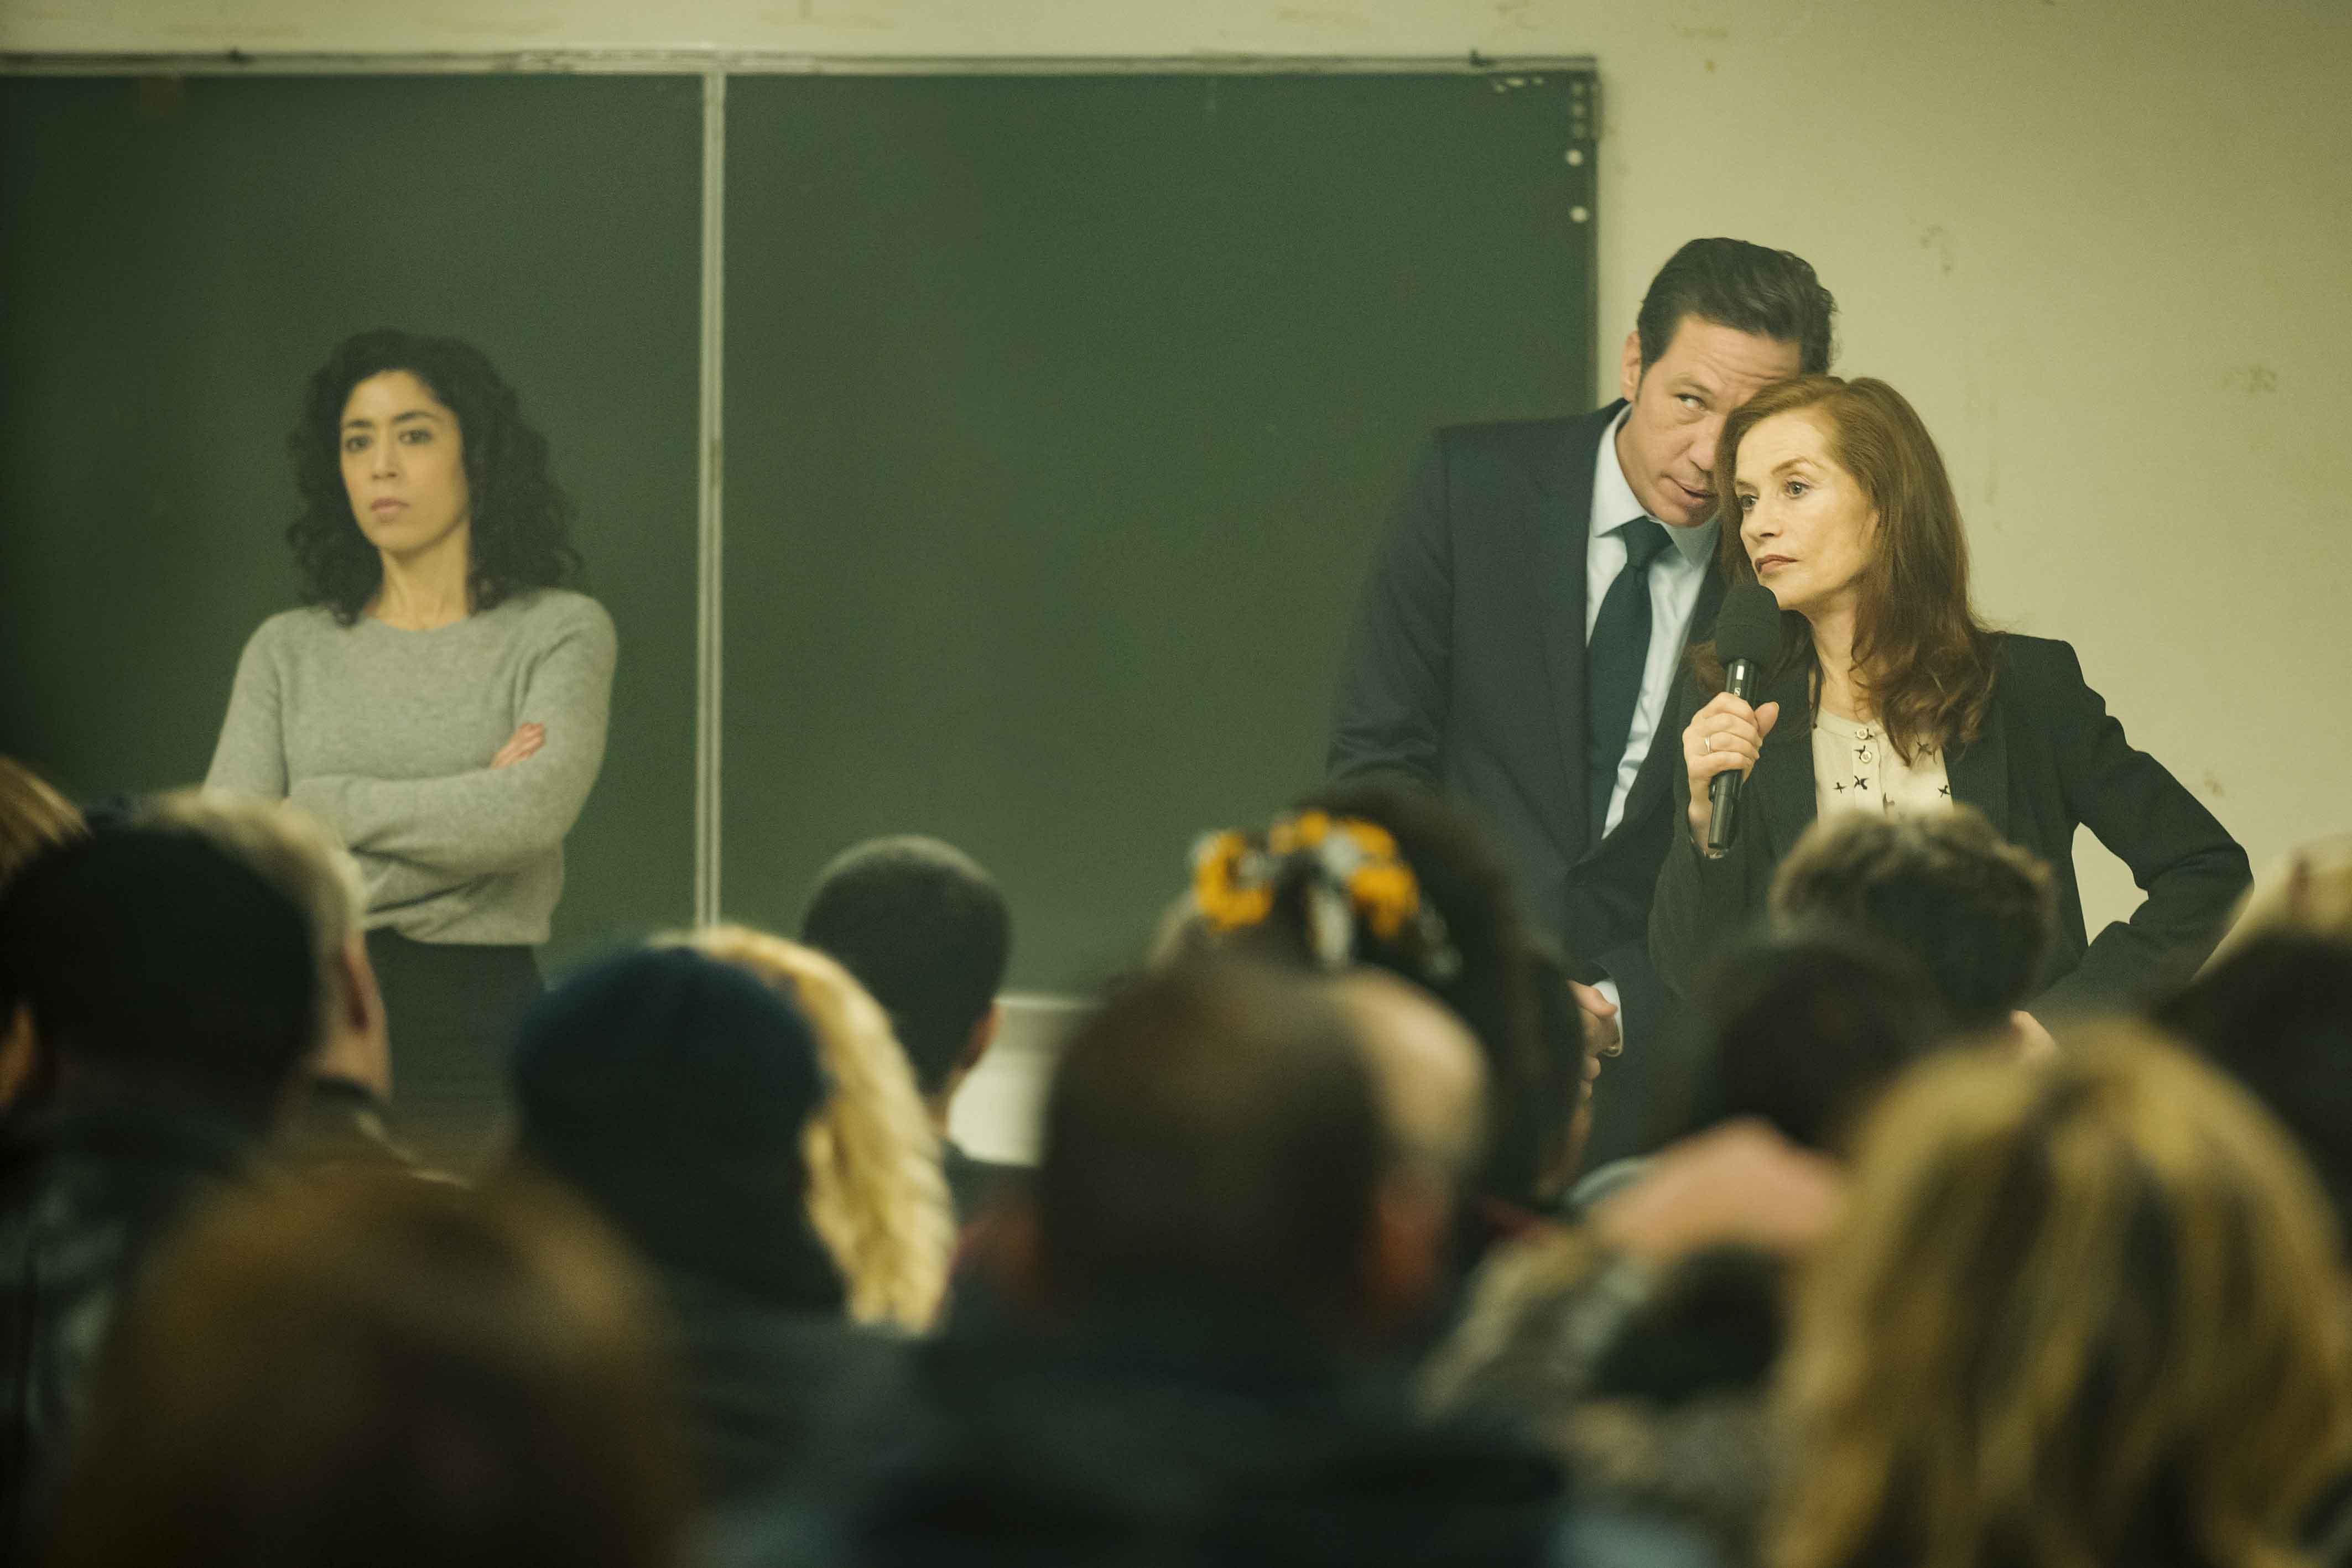 Les Promesses recensione film di Thomas Kruithof con Isabelle Huppert